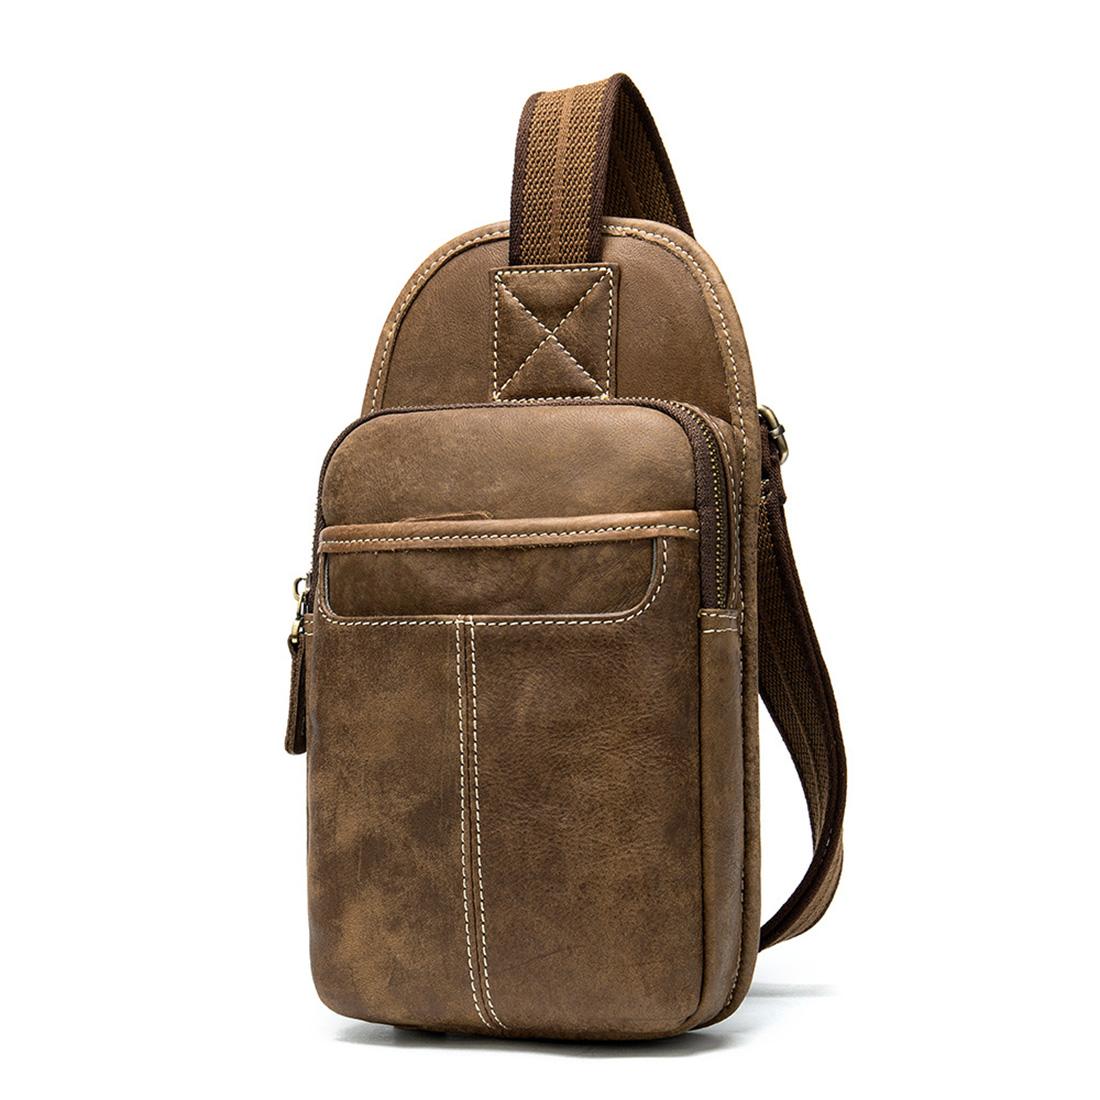 Vintage Genuine Leather Mens Small Messenger Best Waist Pack Side Bag Brown